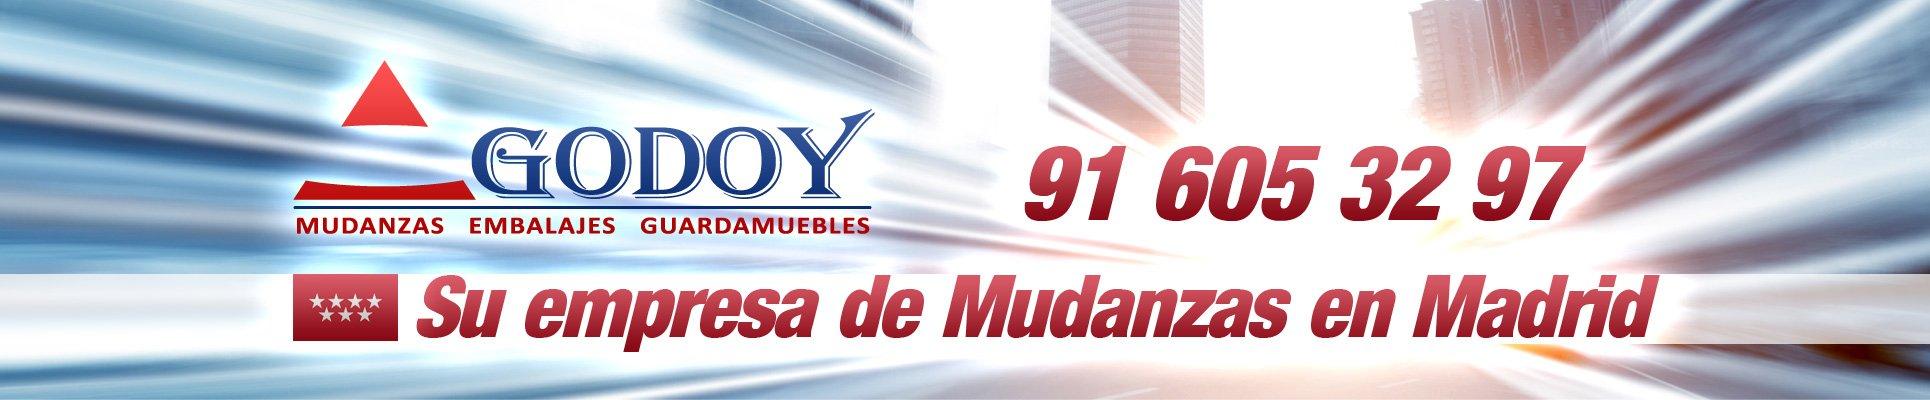 mudanzas-madrid-godoy11